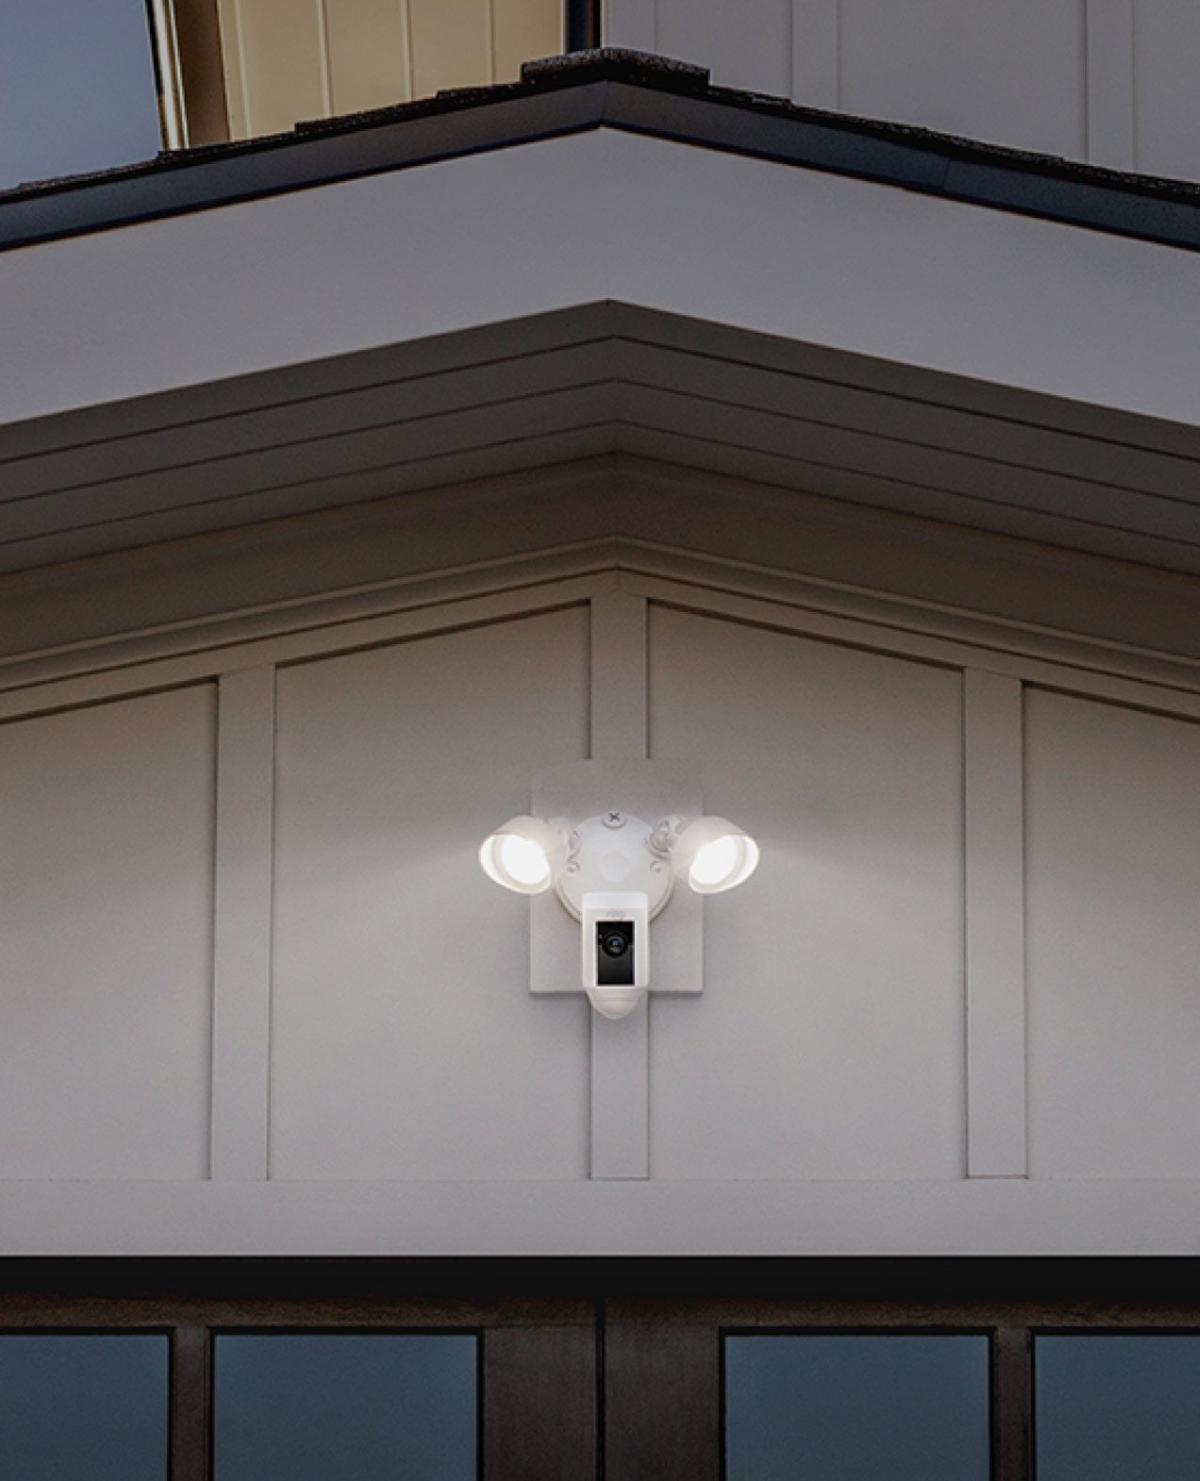 Outdoor Floodlight Cam - Wall-Installation